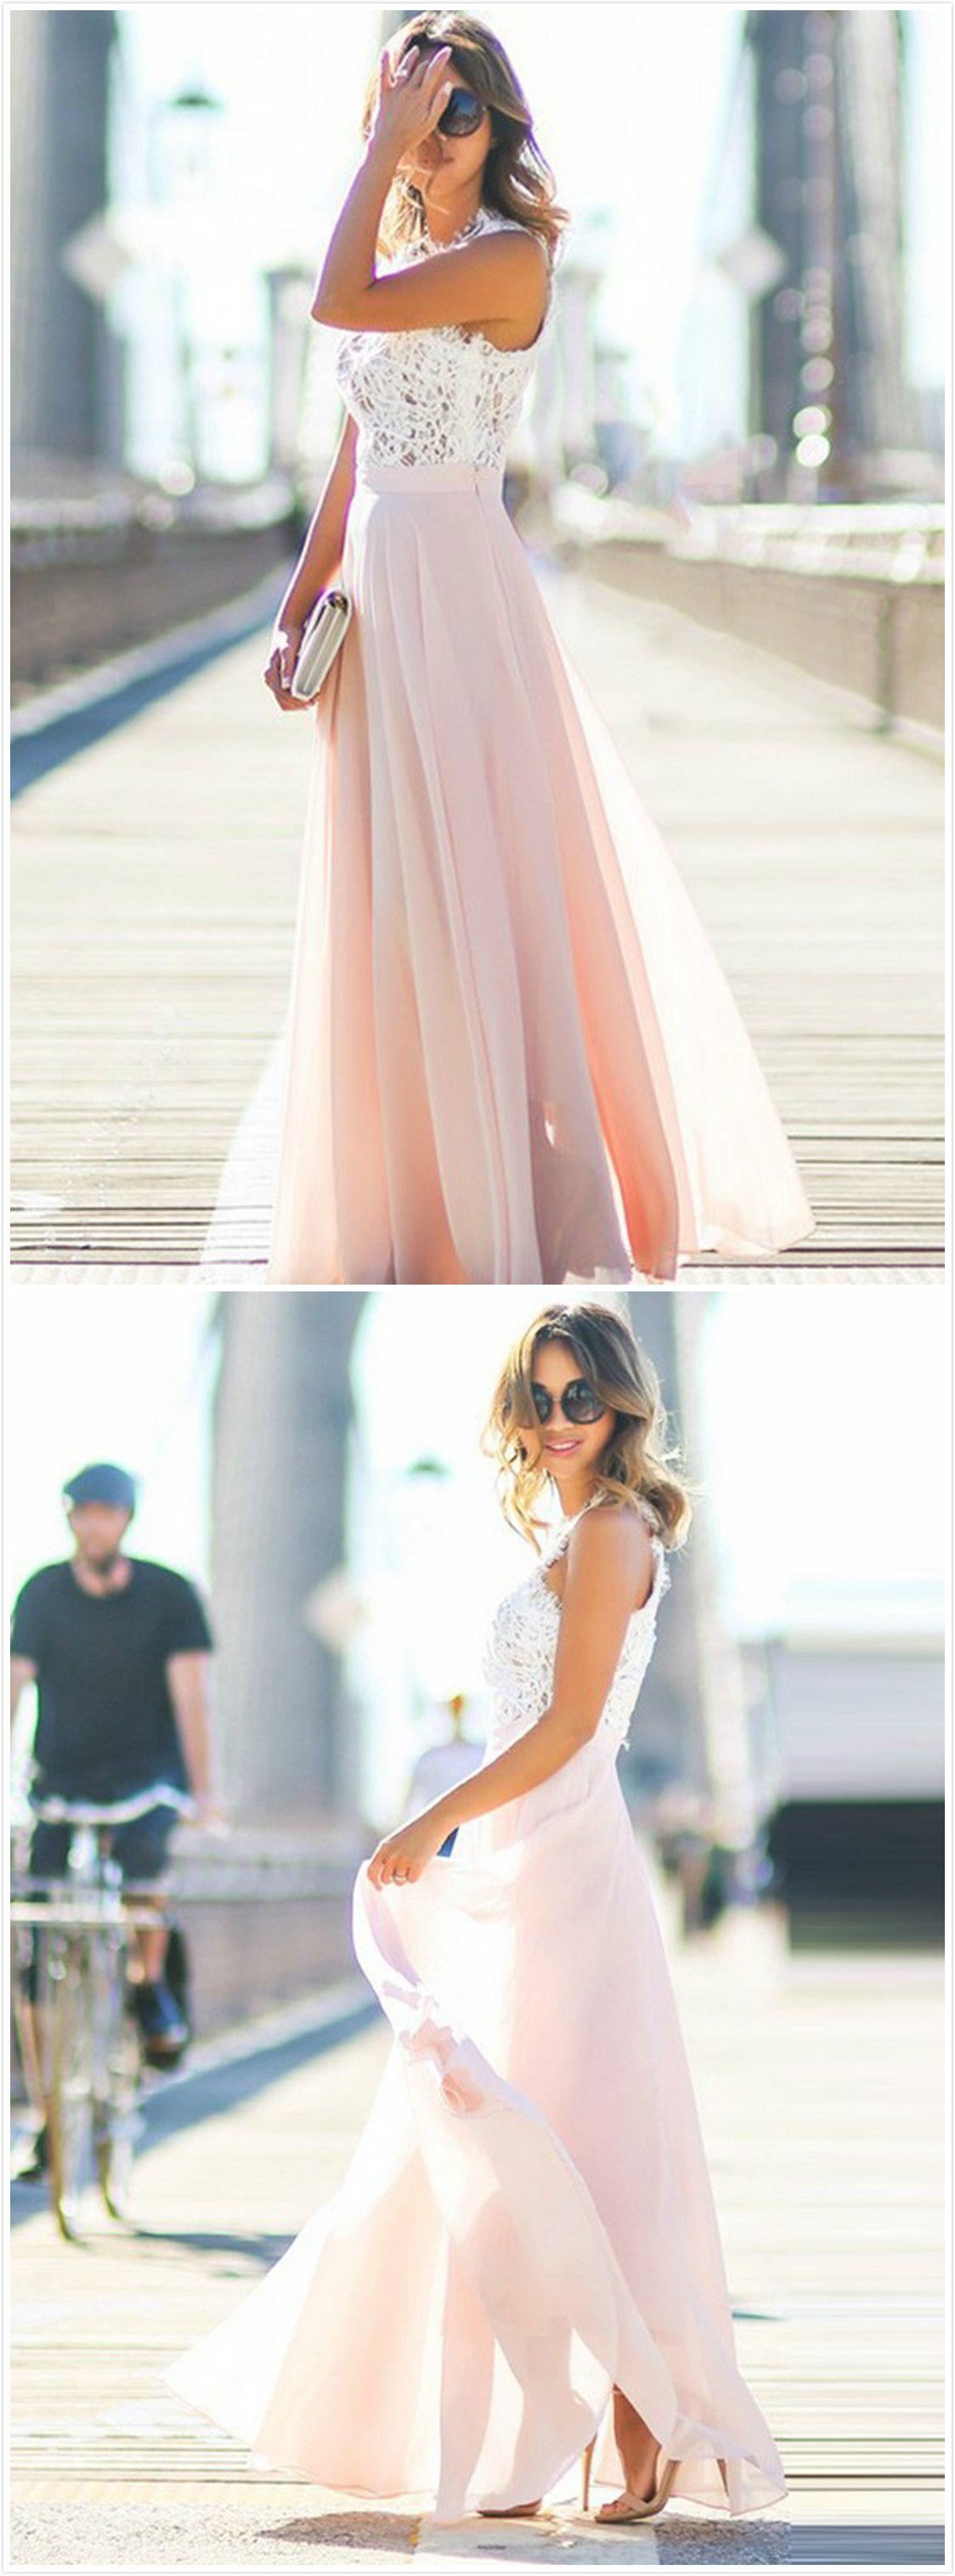 Elegant Sleeveless Lace Chiffon Evening Party Dress | Kunstnägel ...